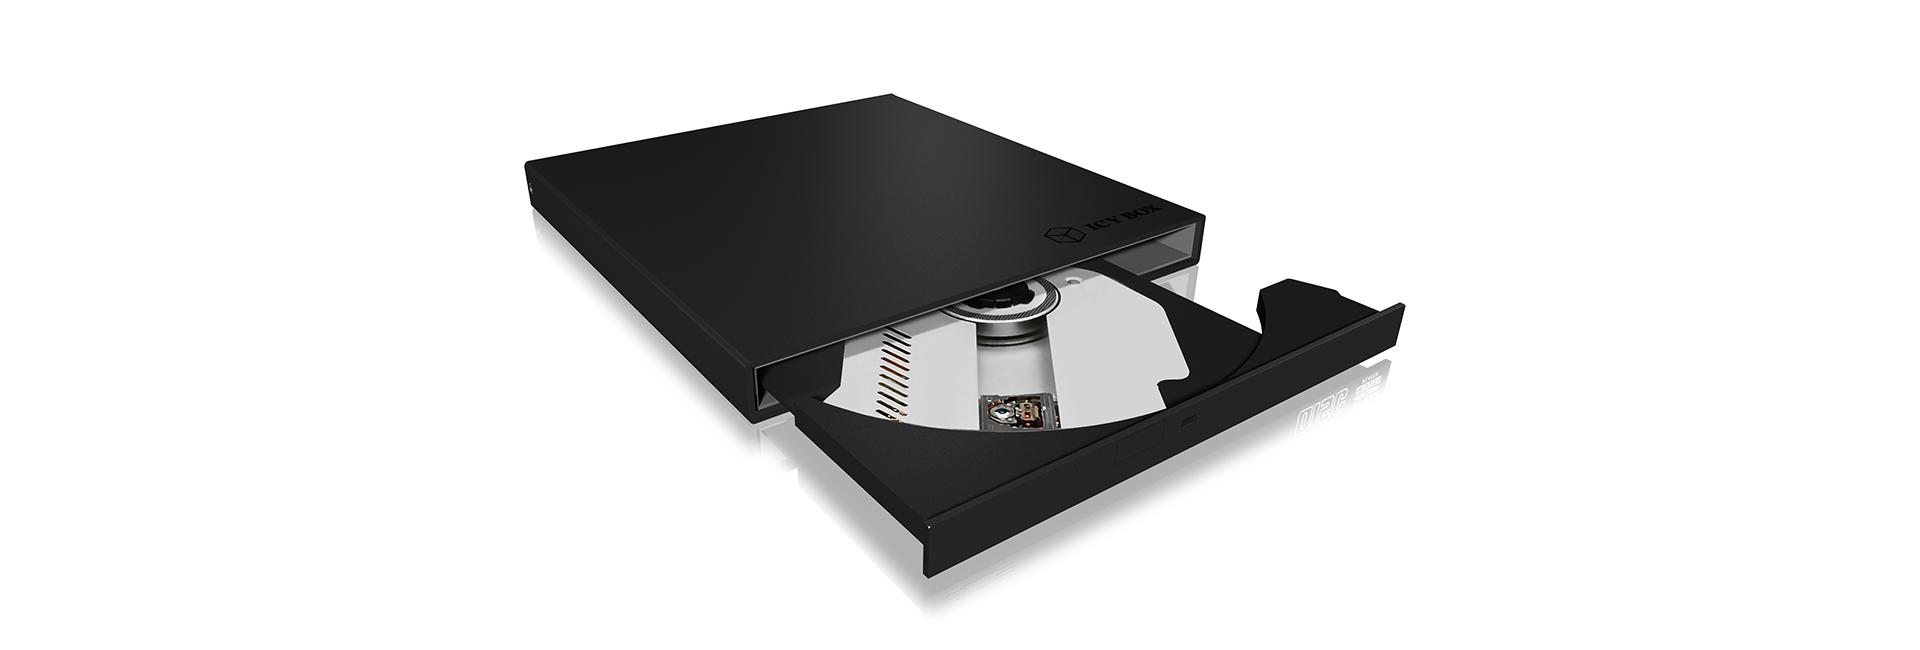 "ICY BOX IB-AC640a ODD enclosure 13.3 cm (5.25"") SATA Black"